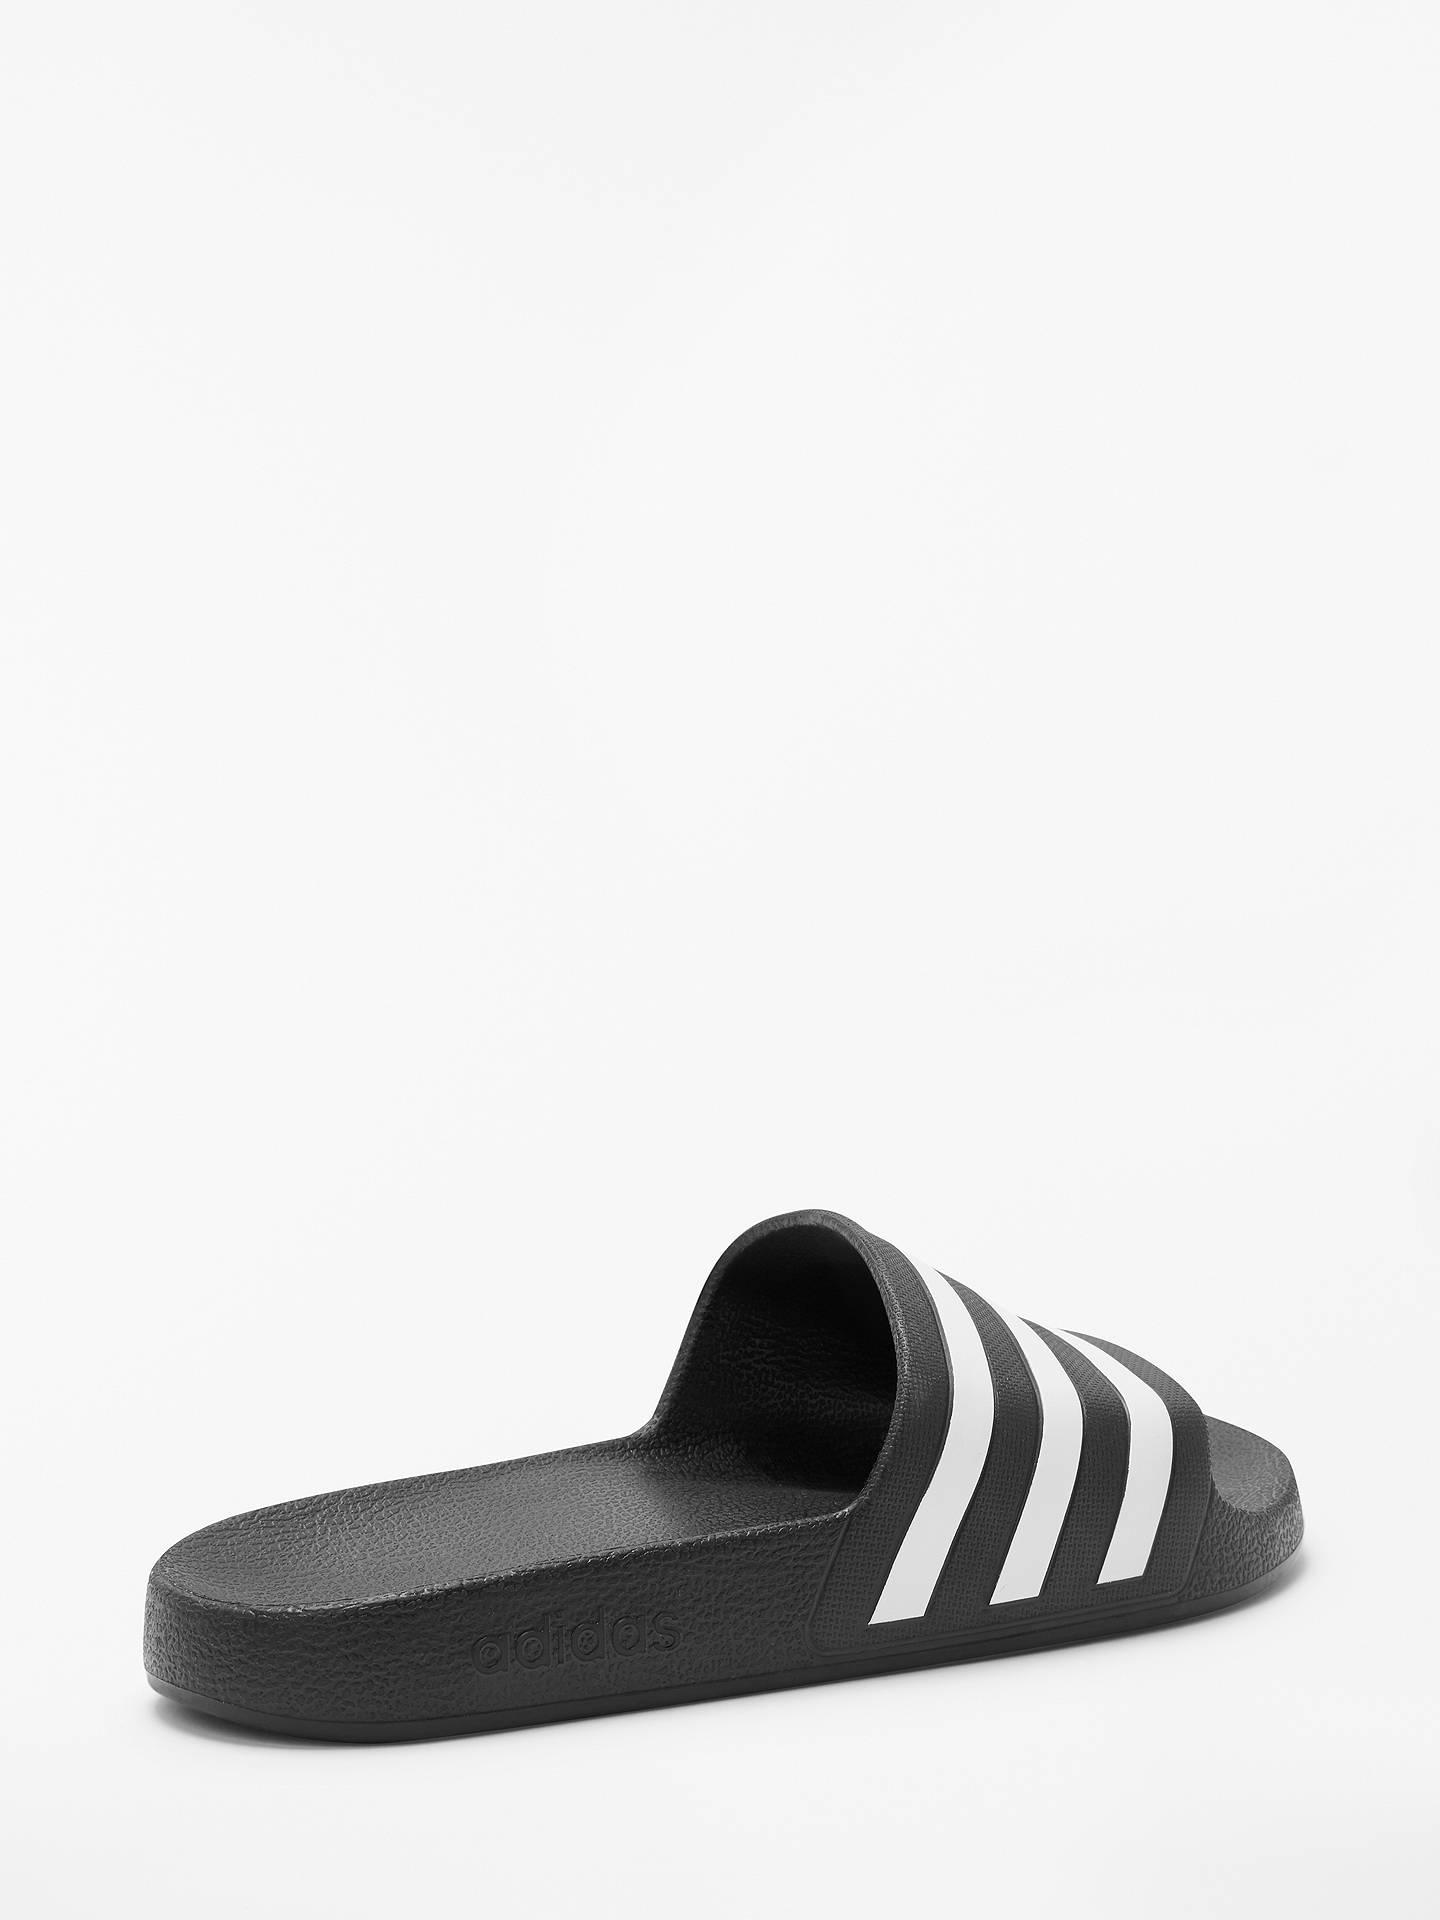 5fe0cf1c8 Buy adidas Adilette Aqua Slides Slippers